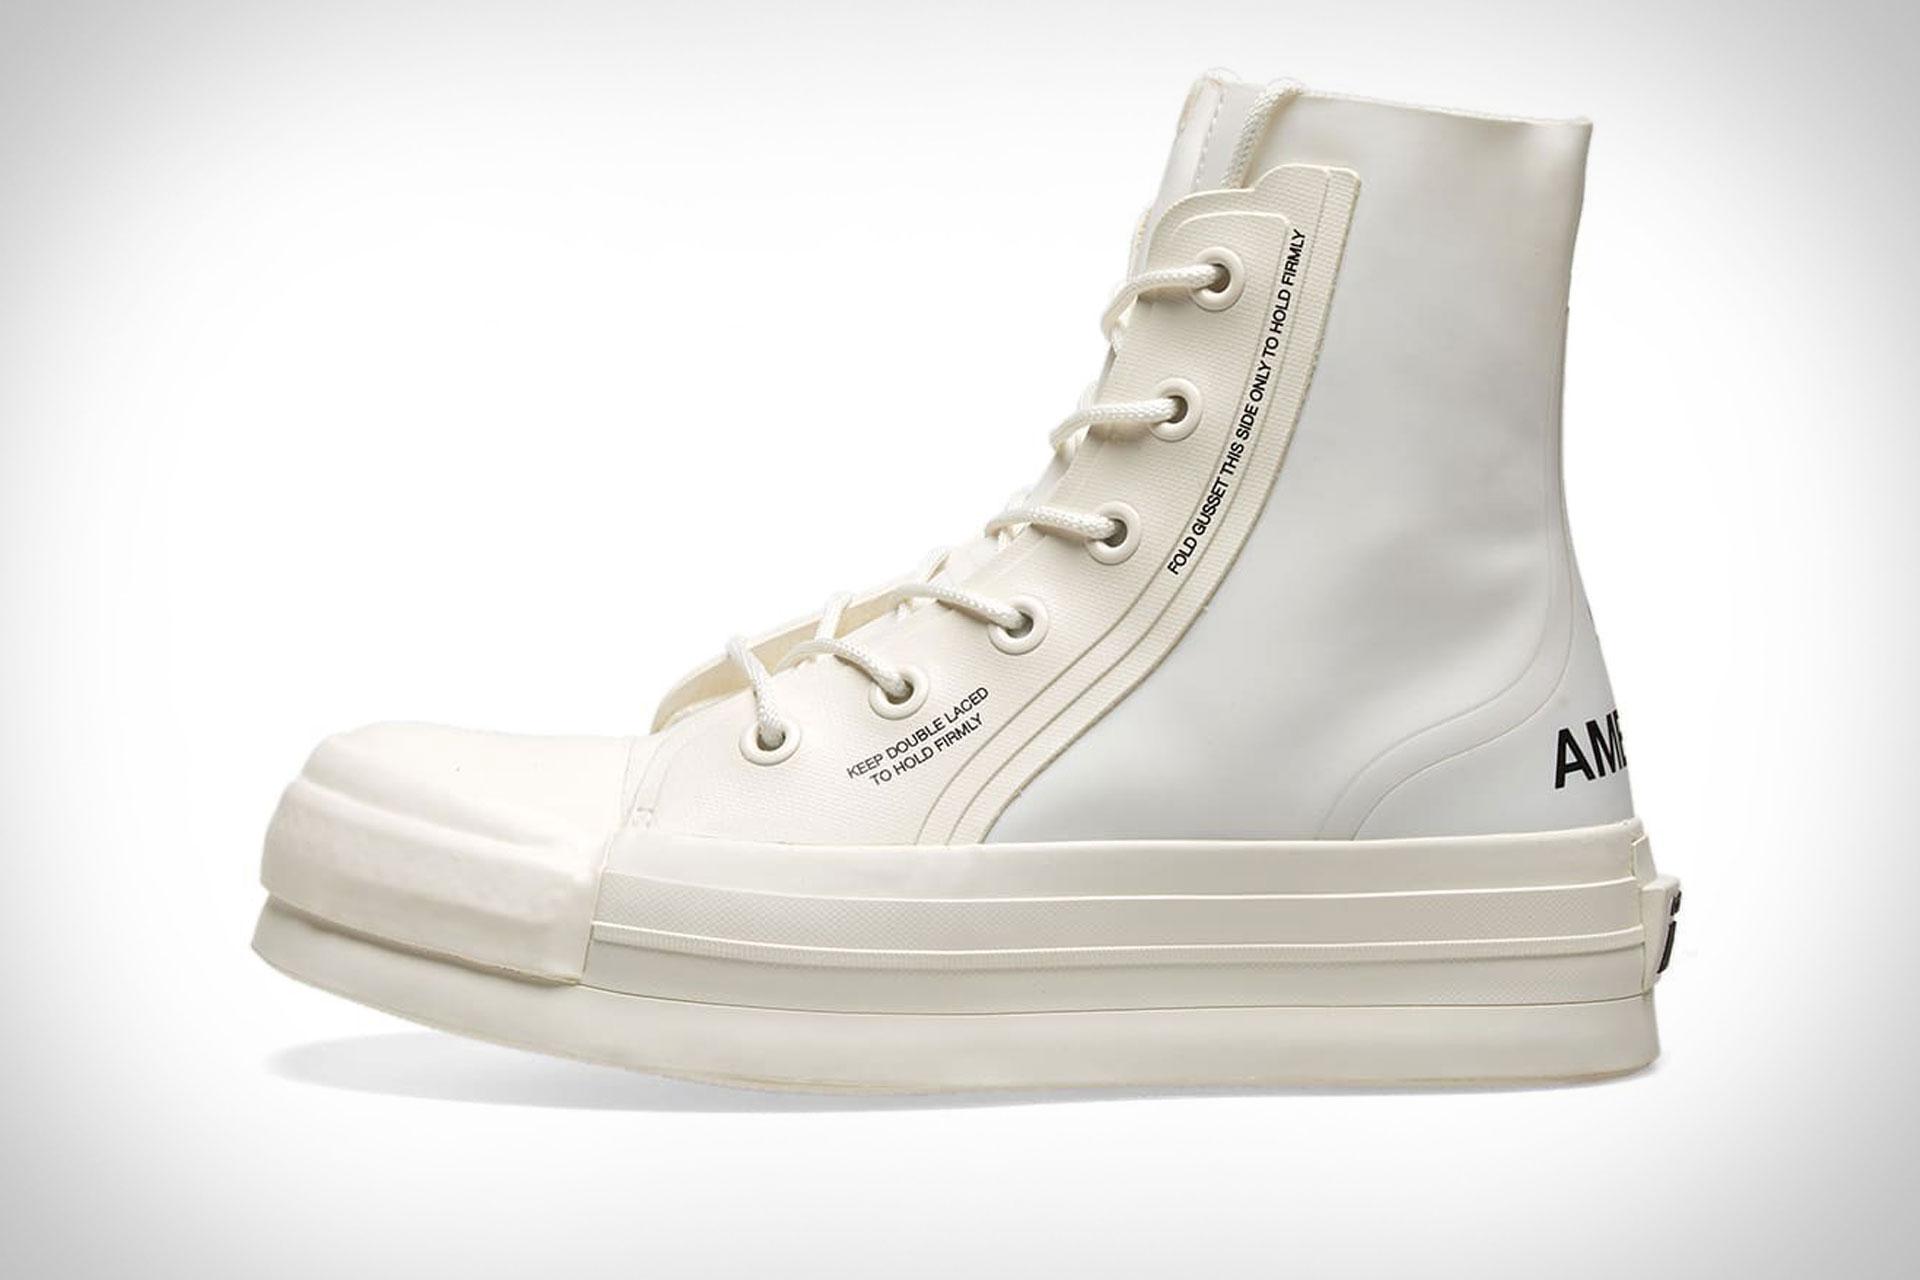 Converse x Ambush Sneakers